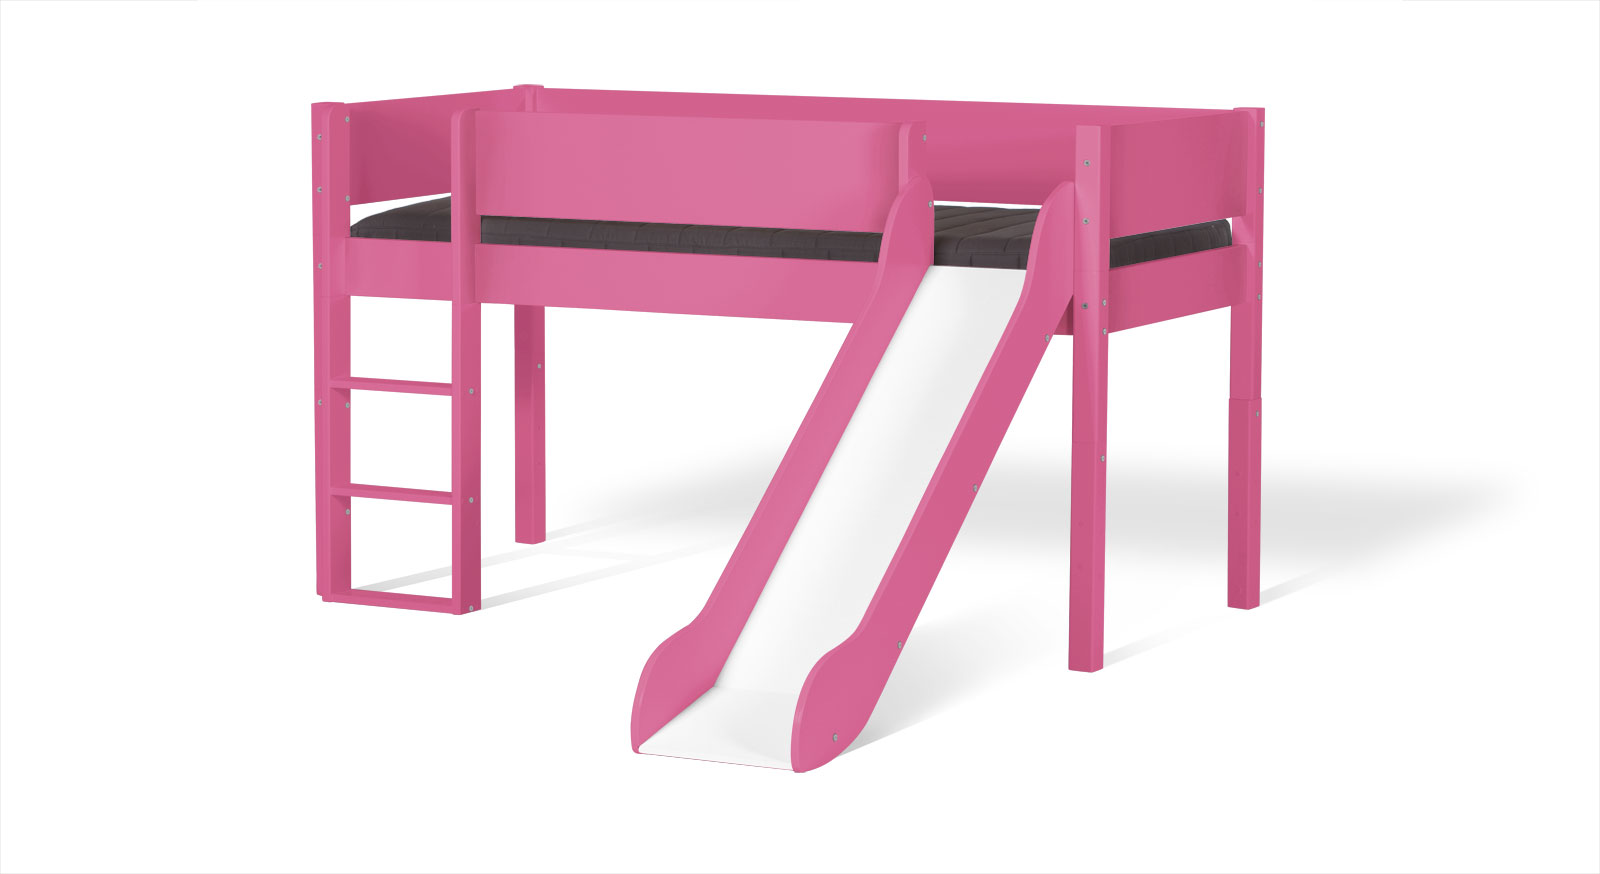 Pinkfarbenes Mini-Rutschen-Hochbett Kids Town